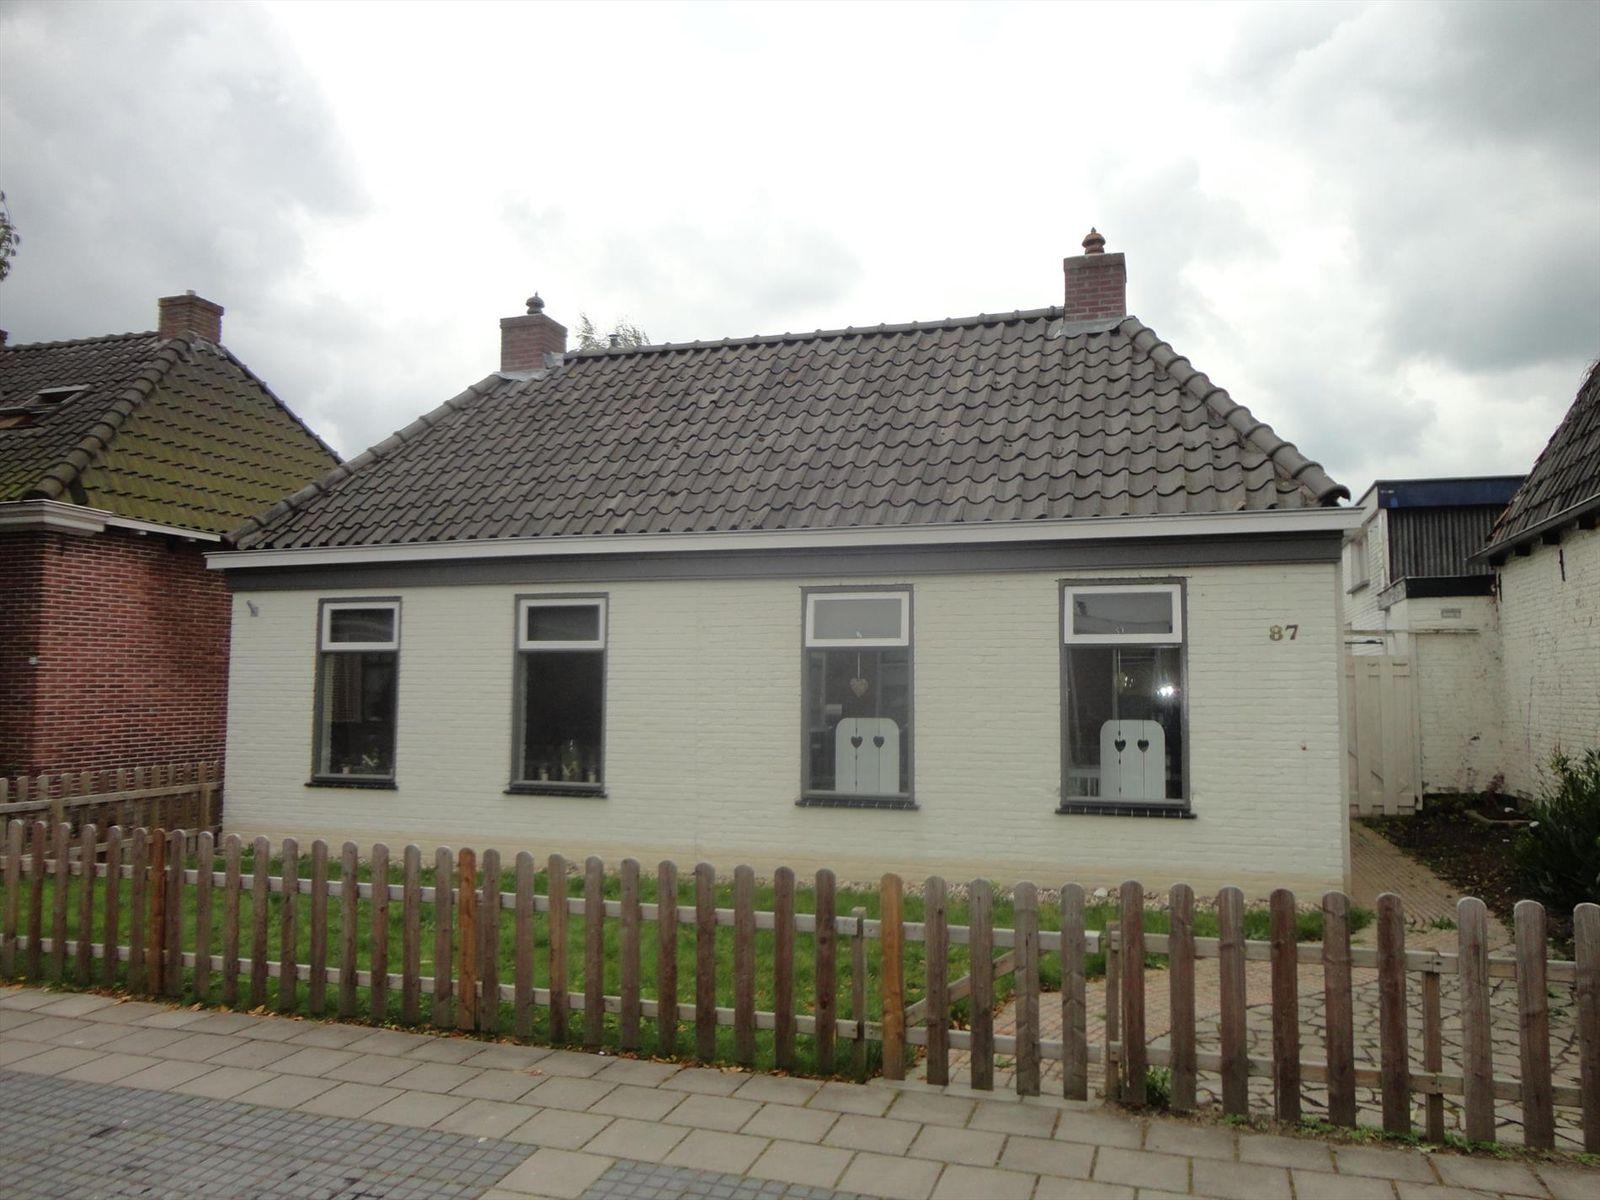 Kerkstraat 87, Wolvega